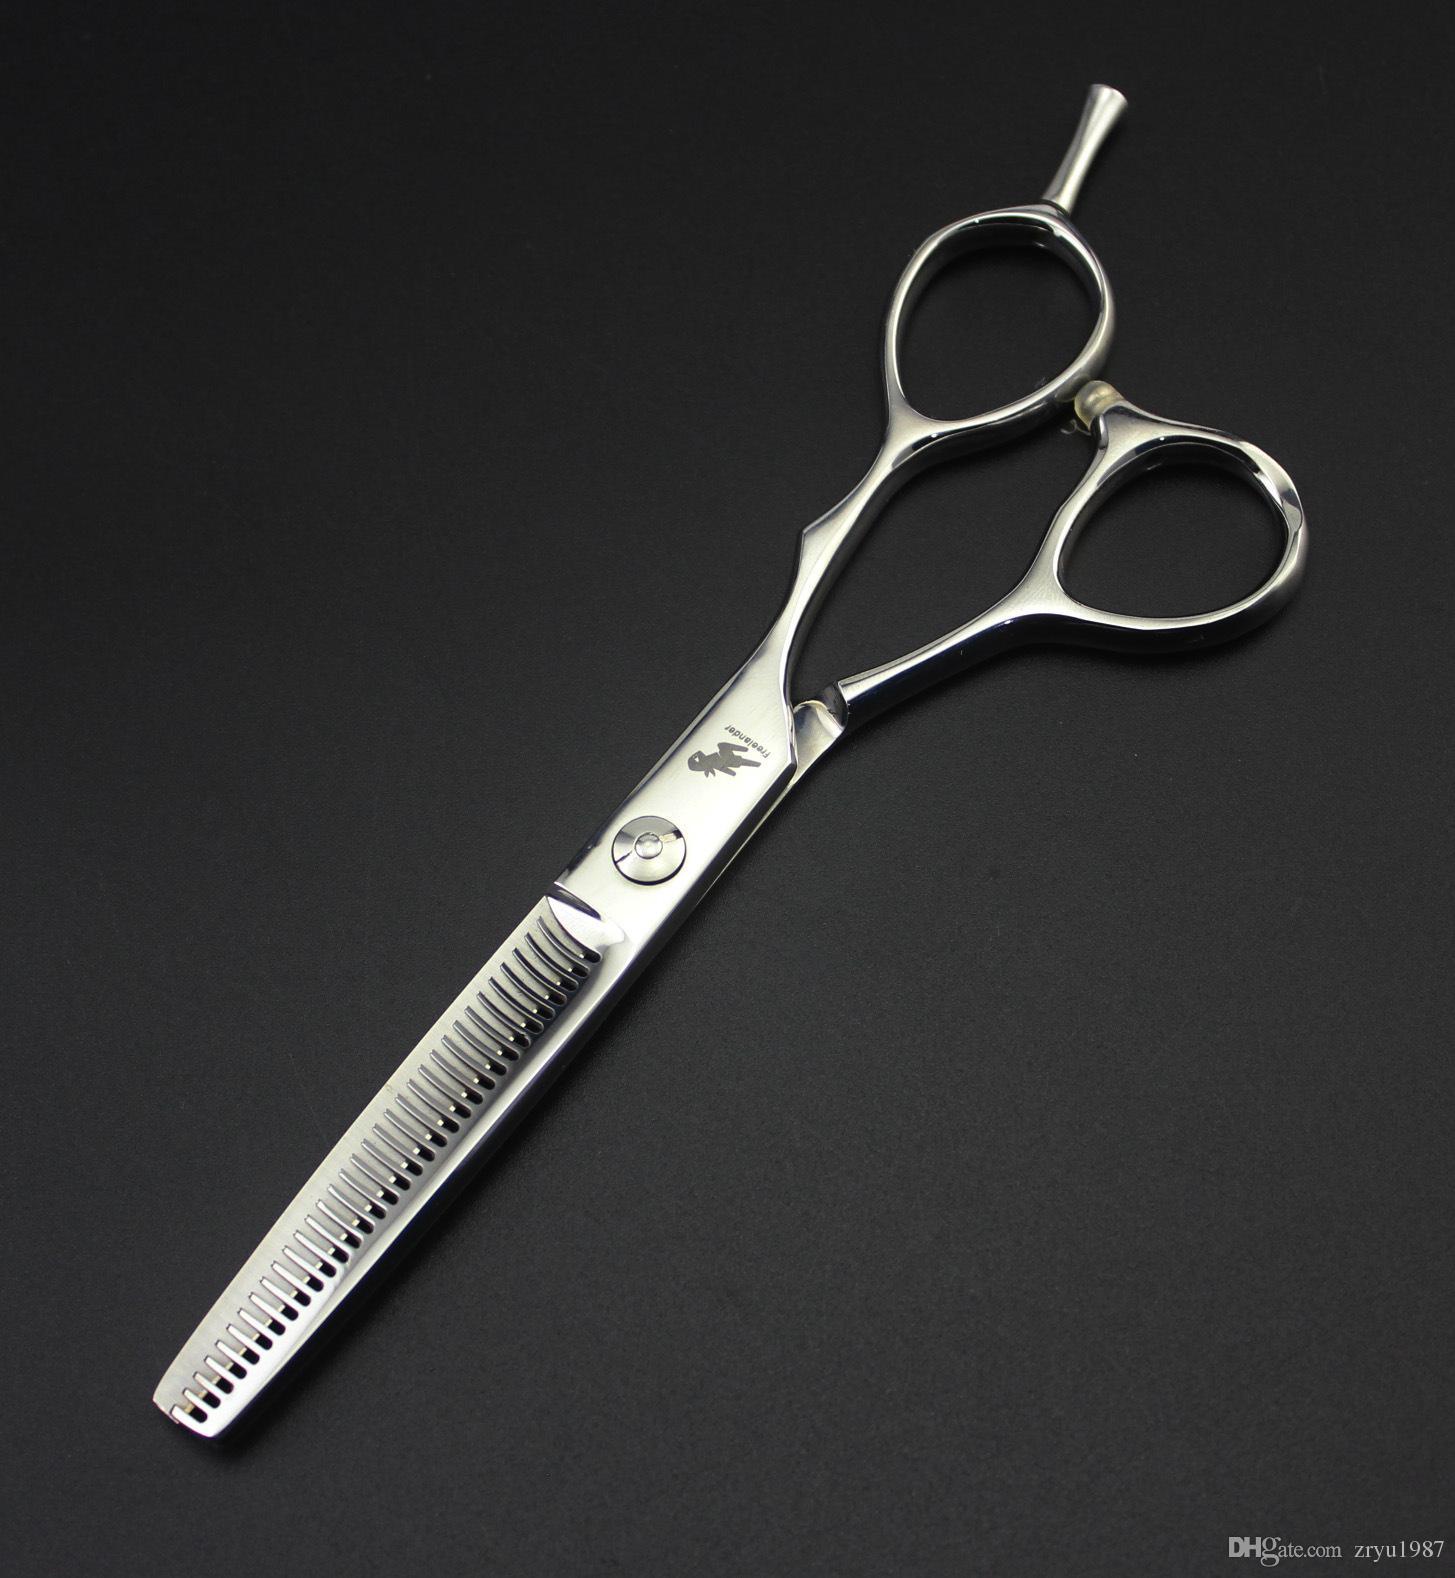 6 Inch Professional Hairdressing Scissors Hair Thinning Scissor cutting sicssor Barber Hairdresser Tool Salon Equipment